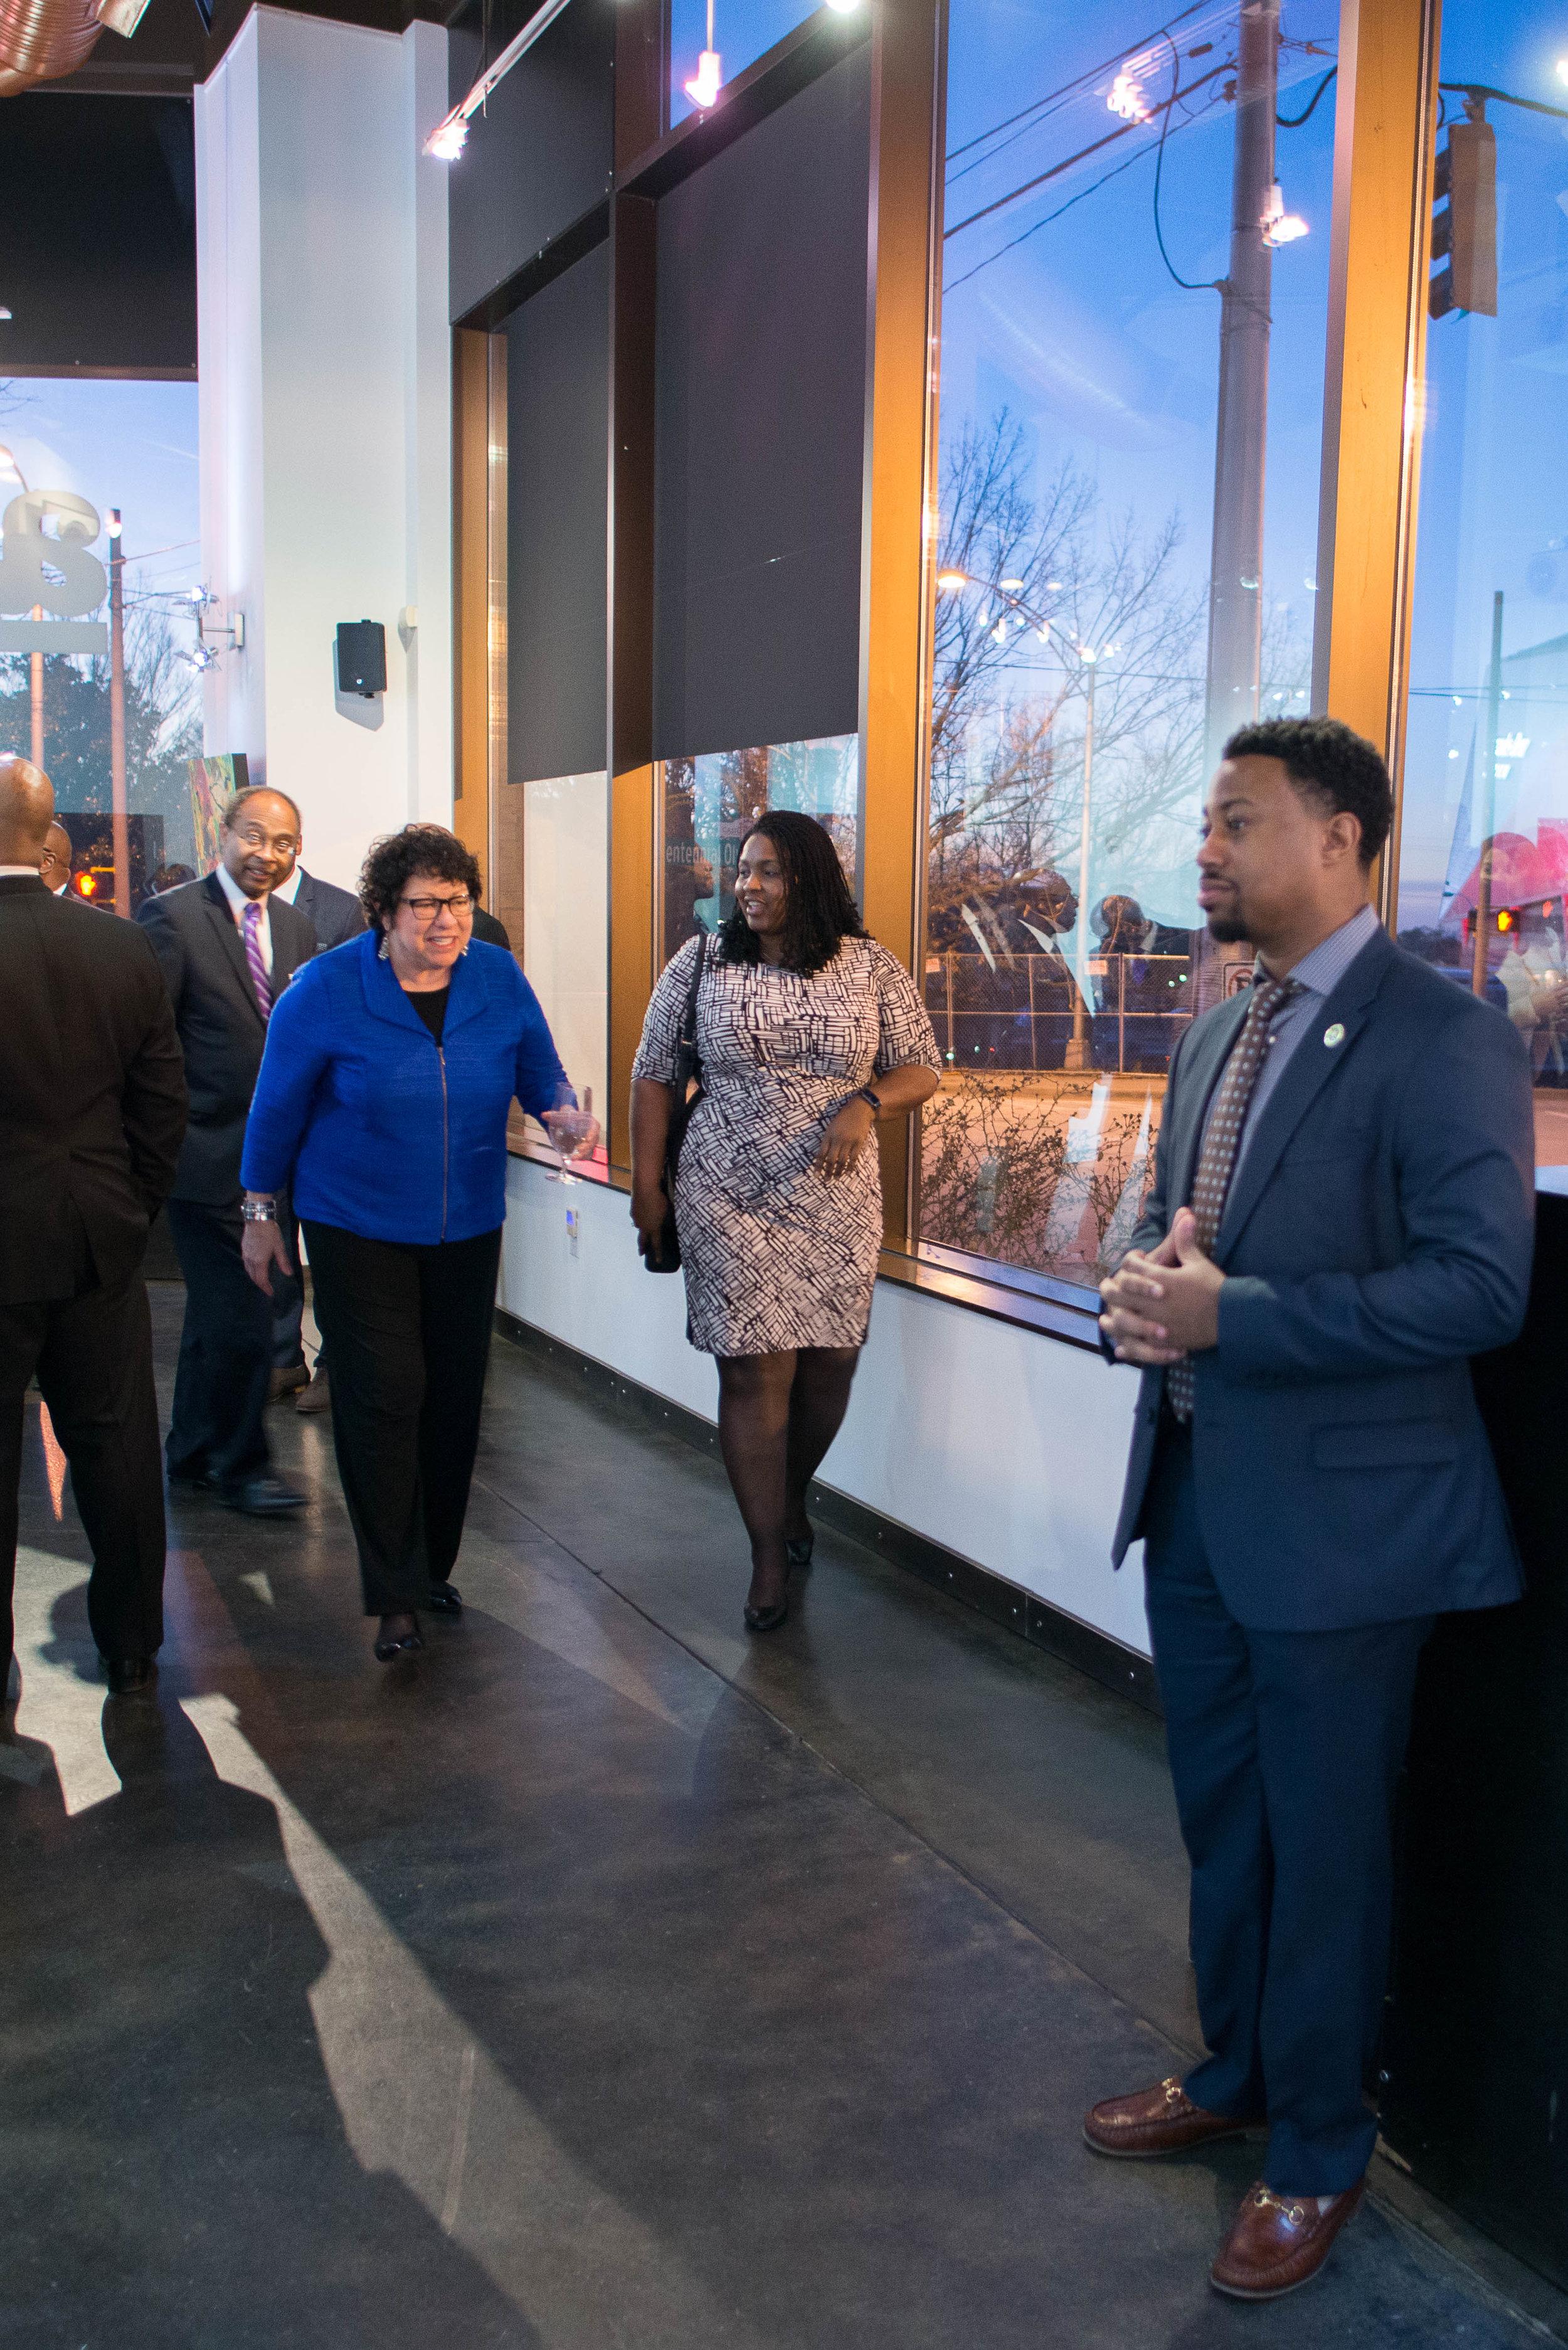 Justice Sotomayor Event Photos.JPG